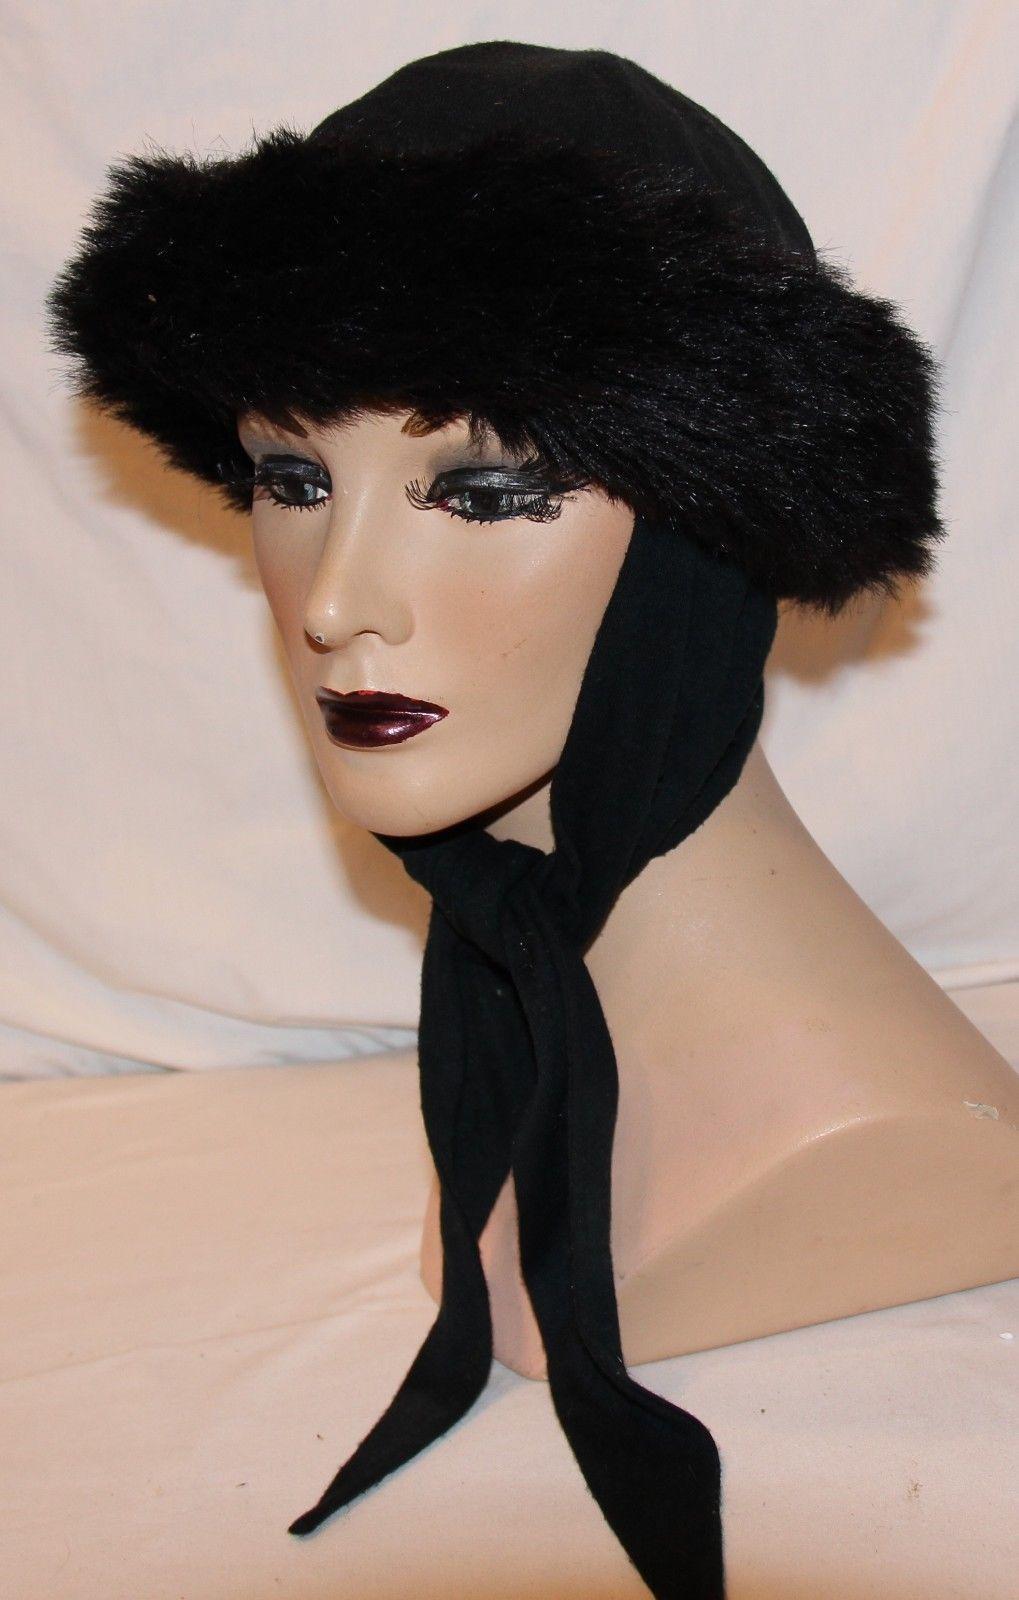 43d92c08211 57. 57. Previous. Betmar Womens Black Hat Attached Scarf Faux Fur Trim Warm  Winter · Betmar Womens Black Hat Attached Scarf ...